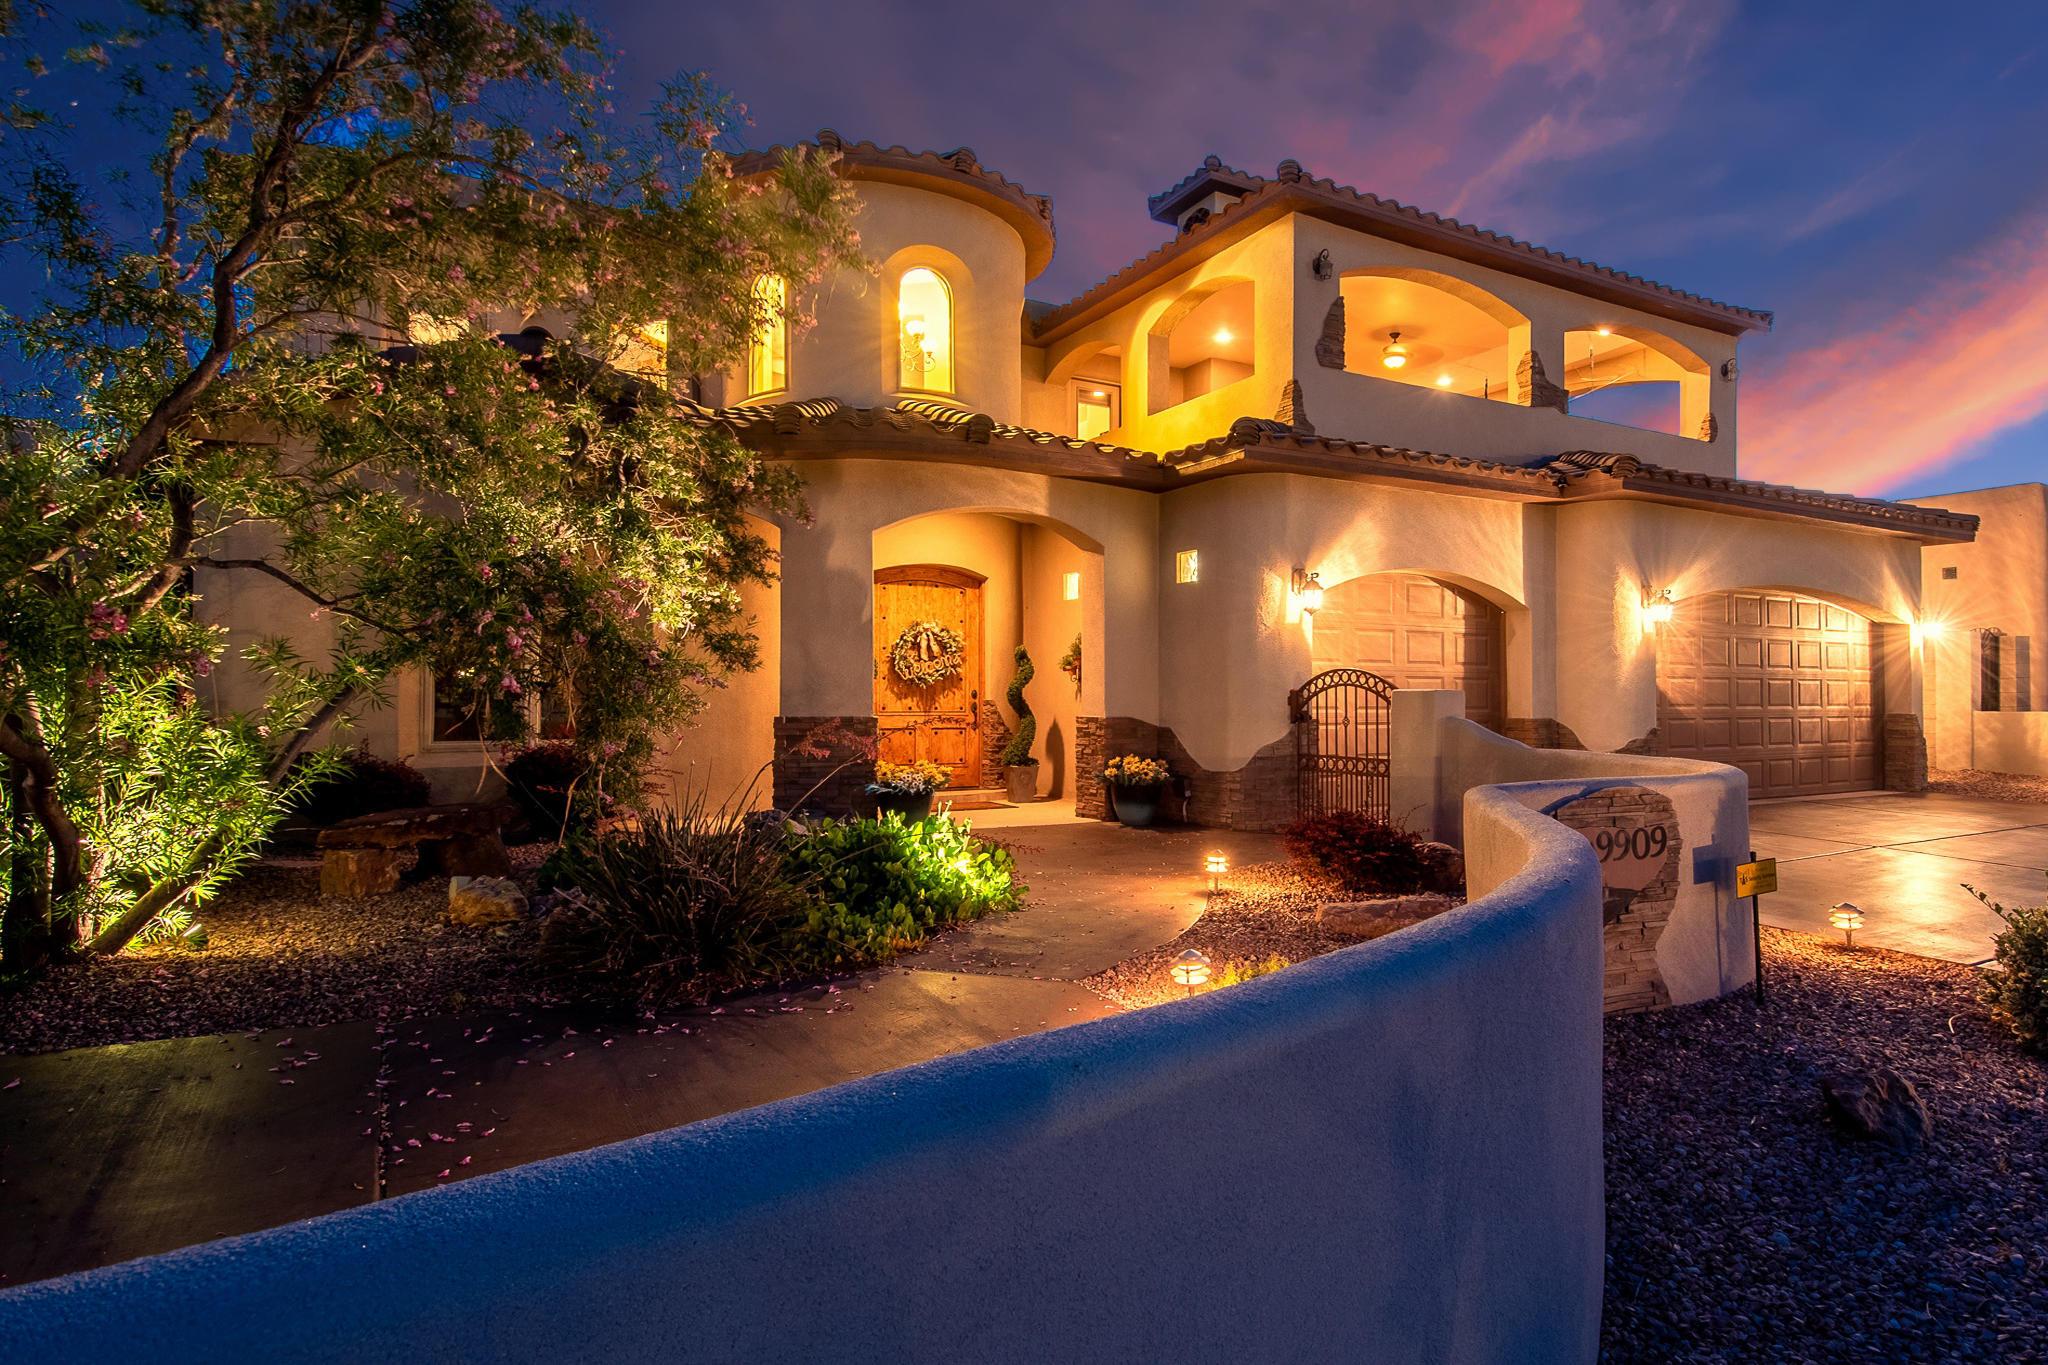 9909 NW Buckeye Street, Northwest Albuquerque and Northwest Heights, New Mexico